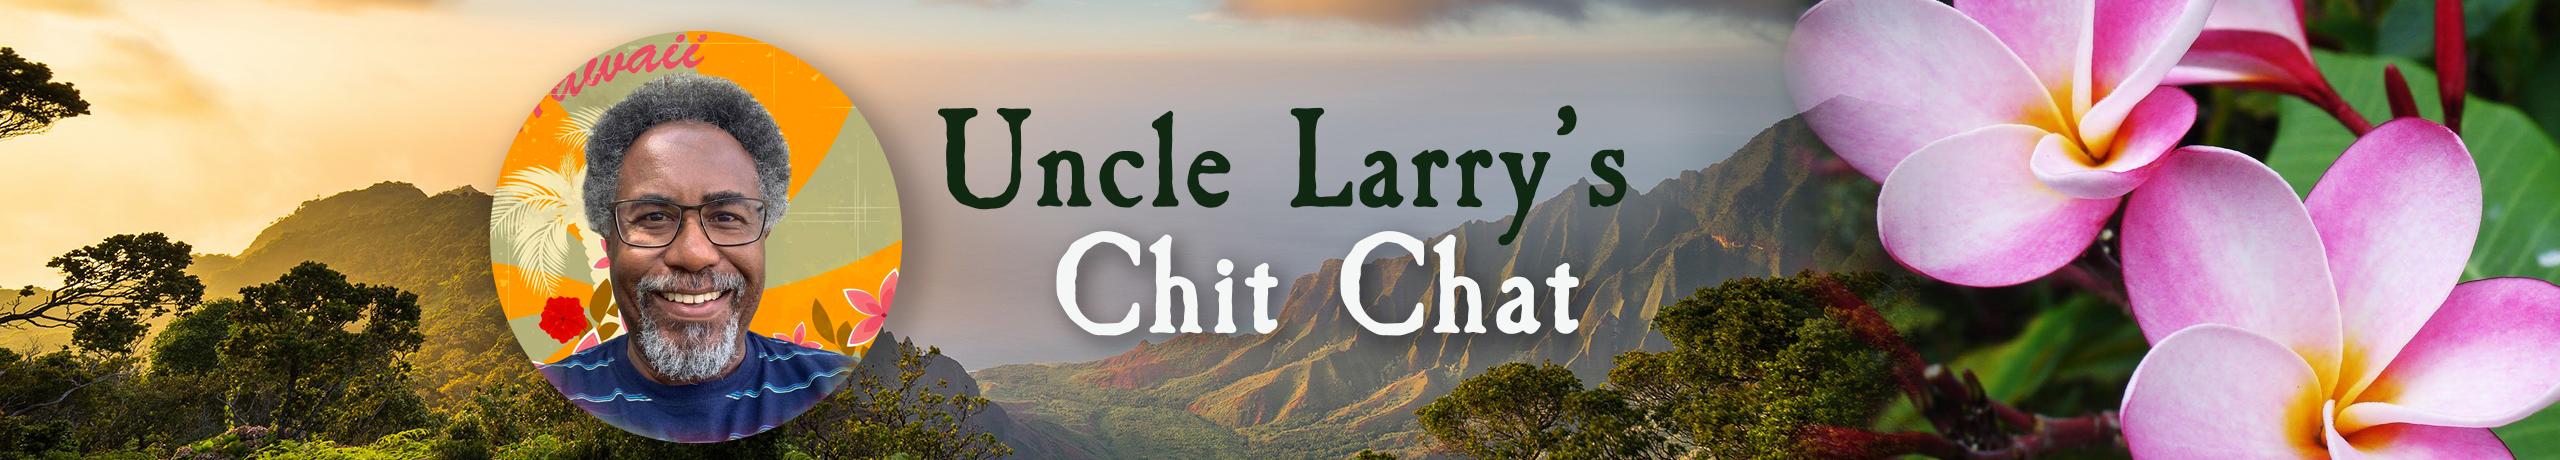 219-uncle_larry-header